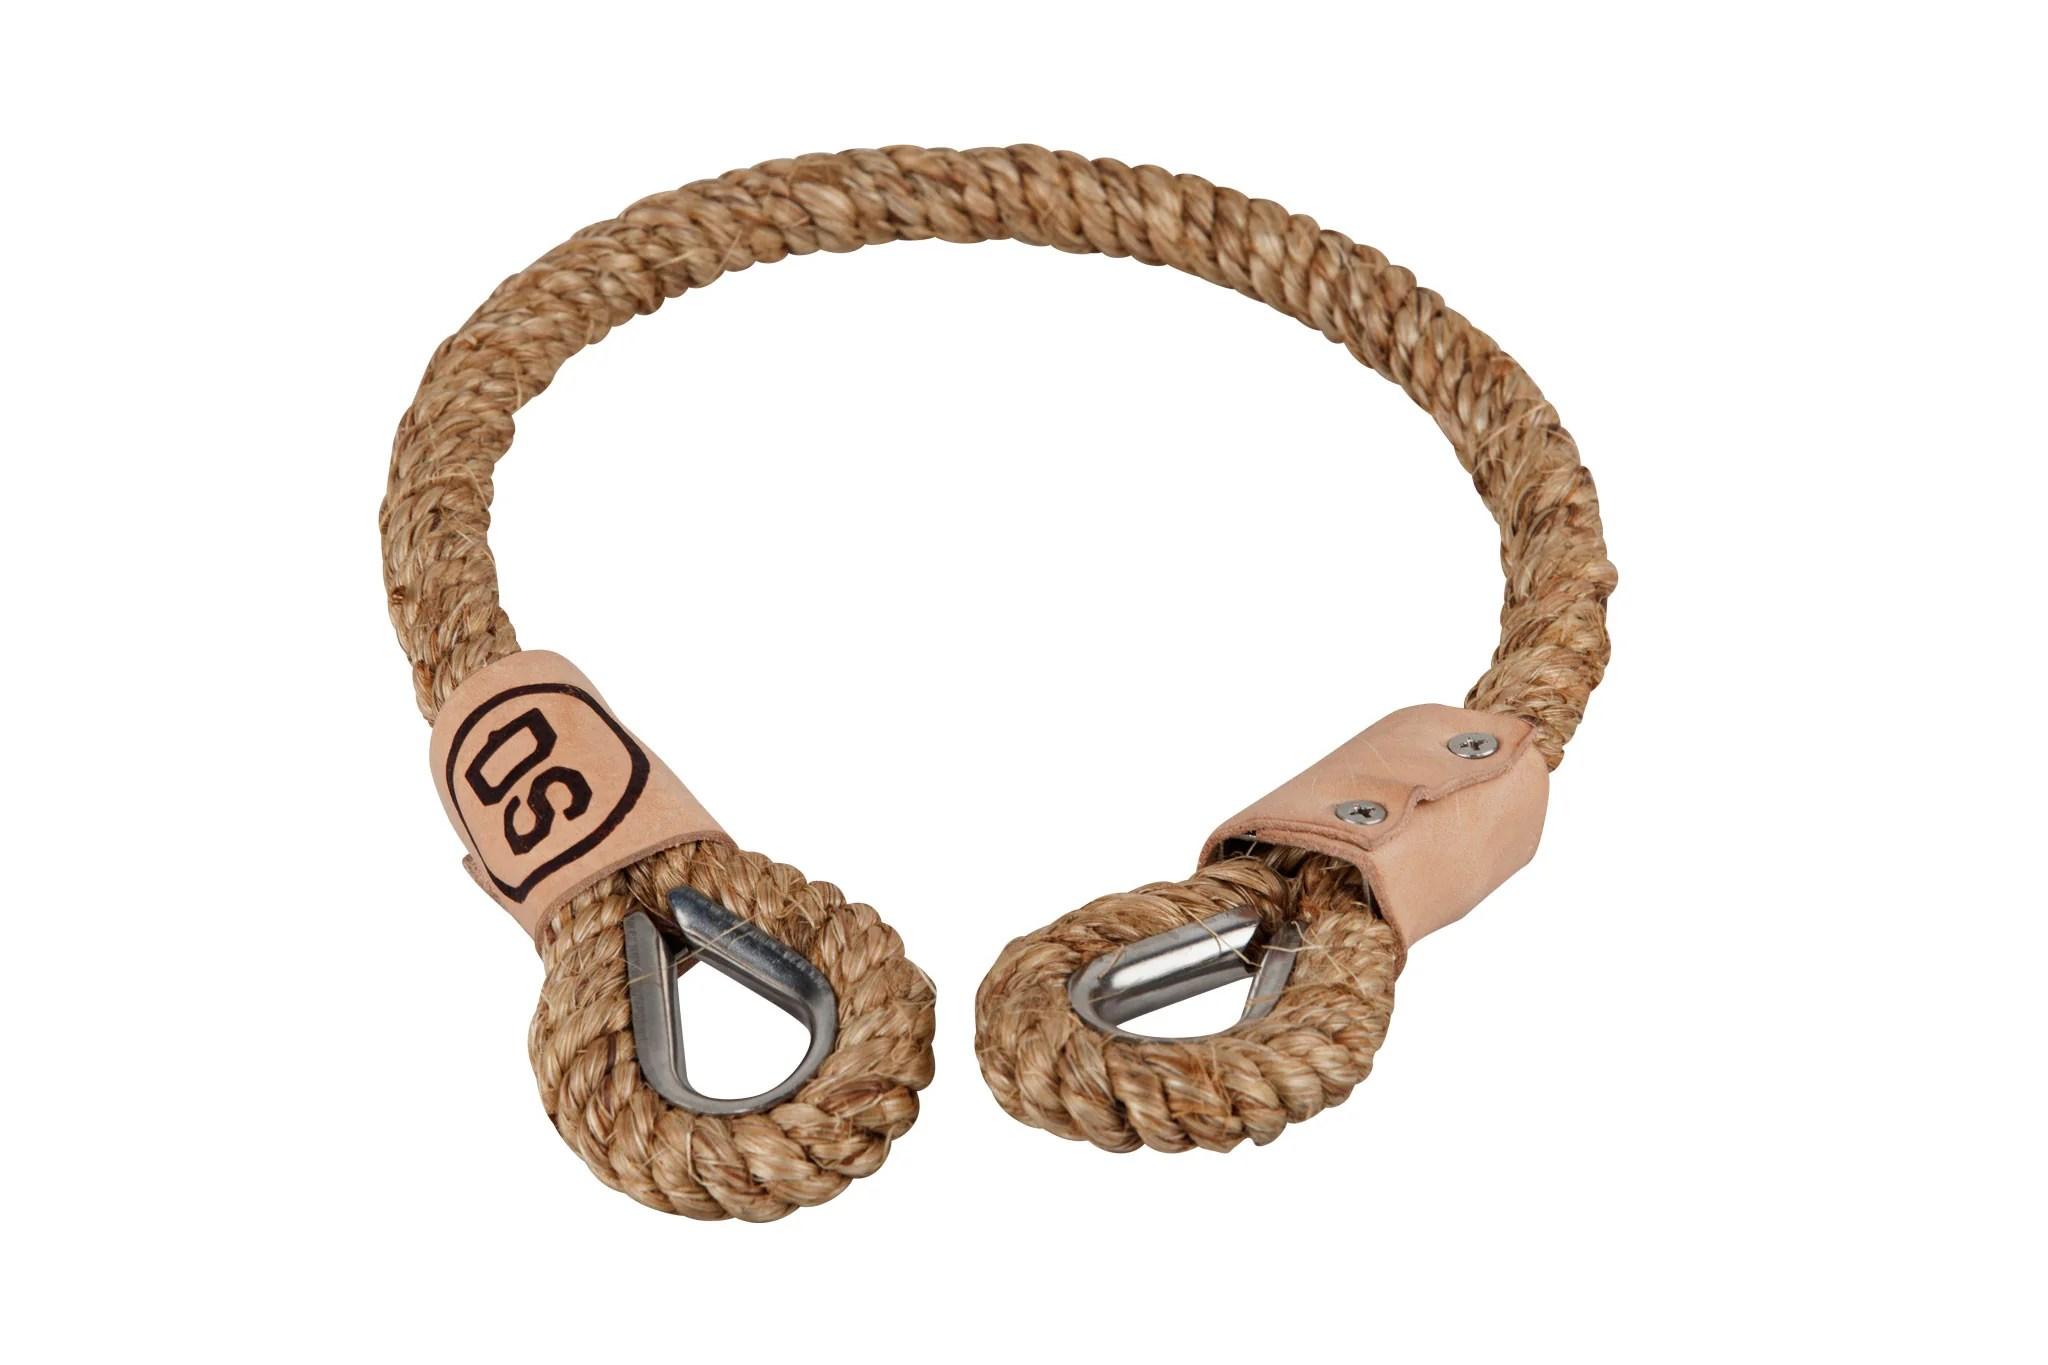 medium resolution of rope locks